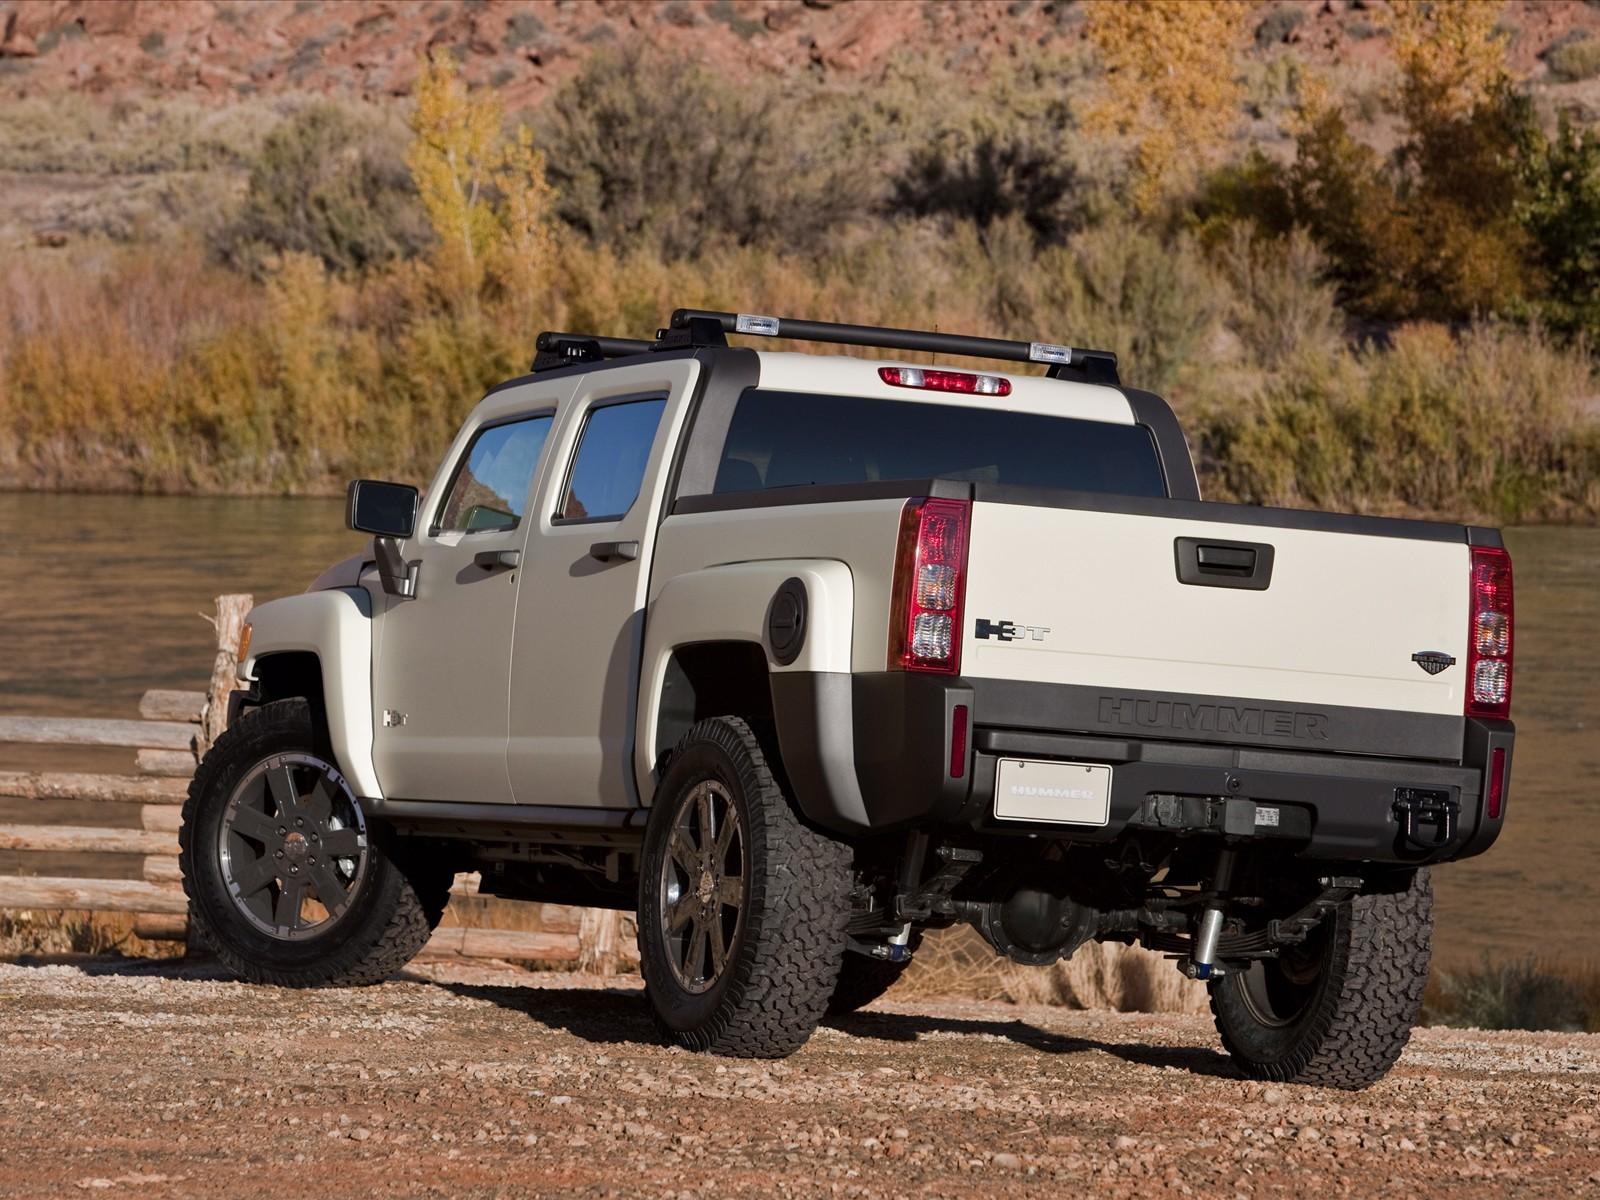 http://1.bp.blogspot.com/-BRzgZet0lDs/UEdIvQEdPRI/AAAAAAAAEVE/HwE0k3wmB1U/s1600/hummer-3t-jeep-in-mountains-hd-wallpapers-1600-x-1200.jpg